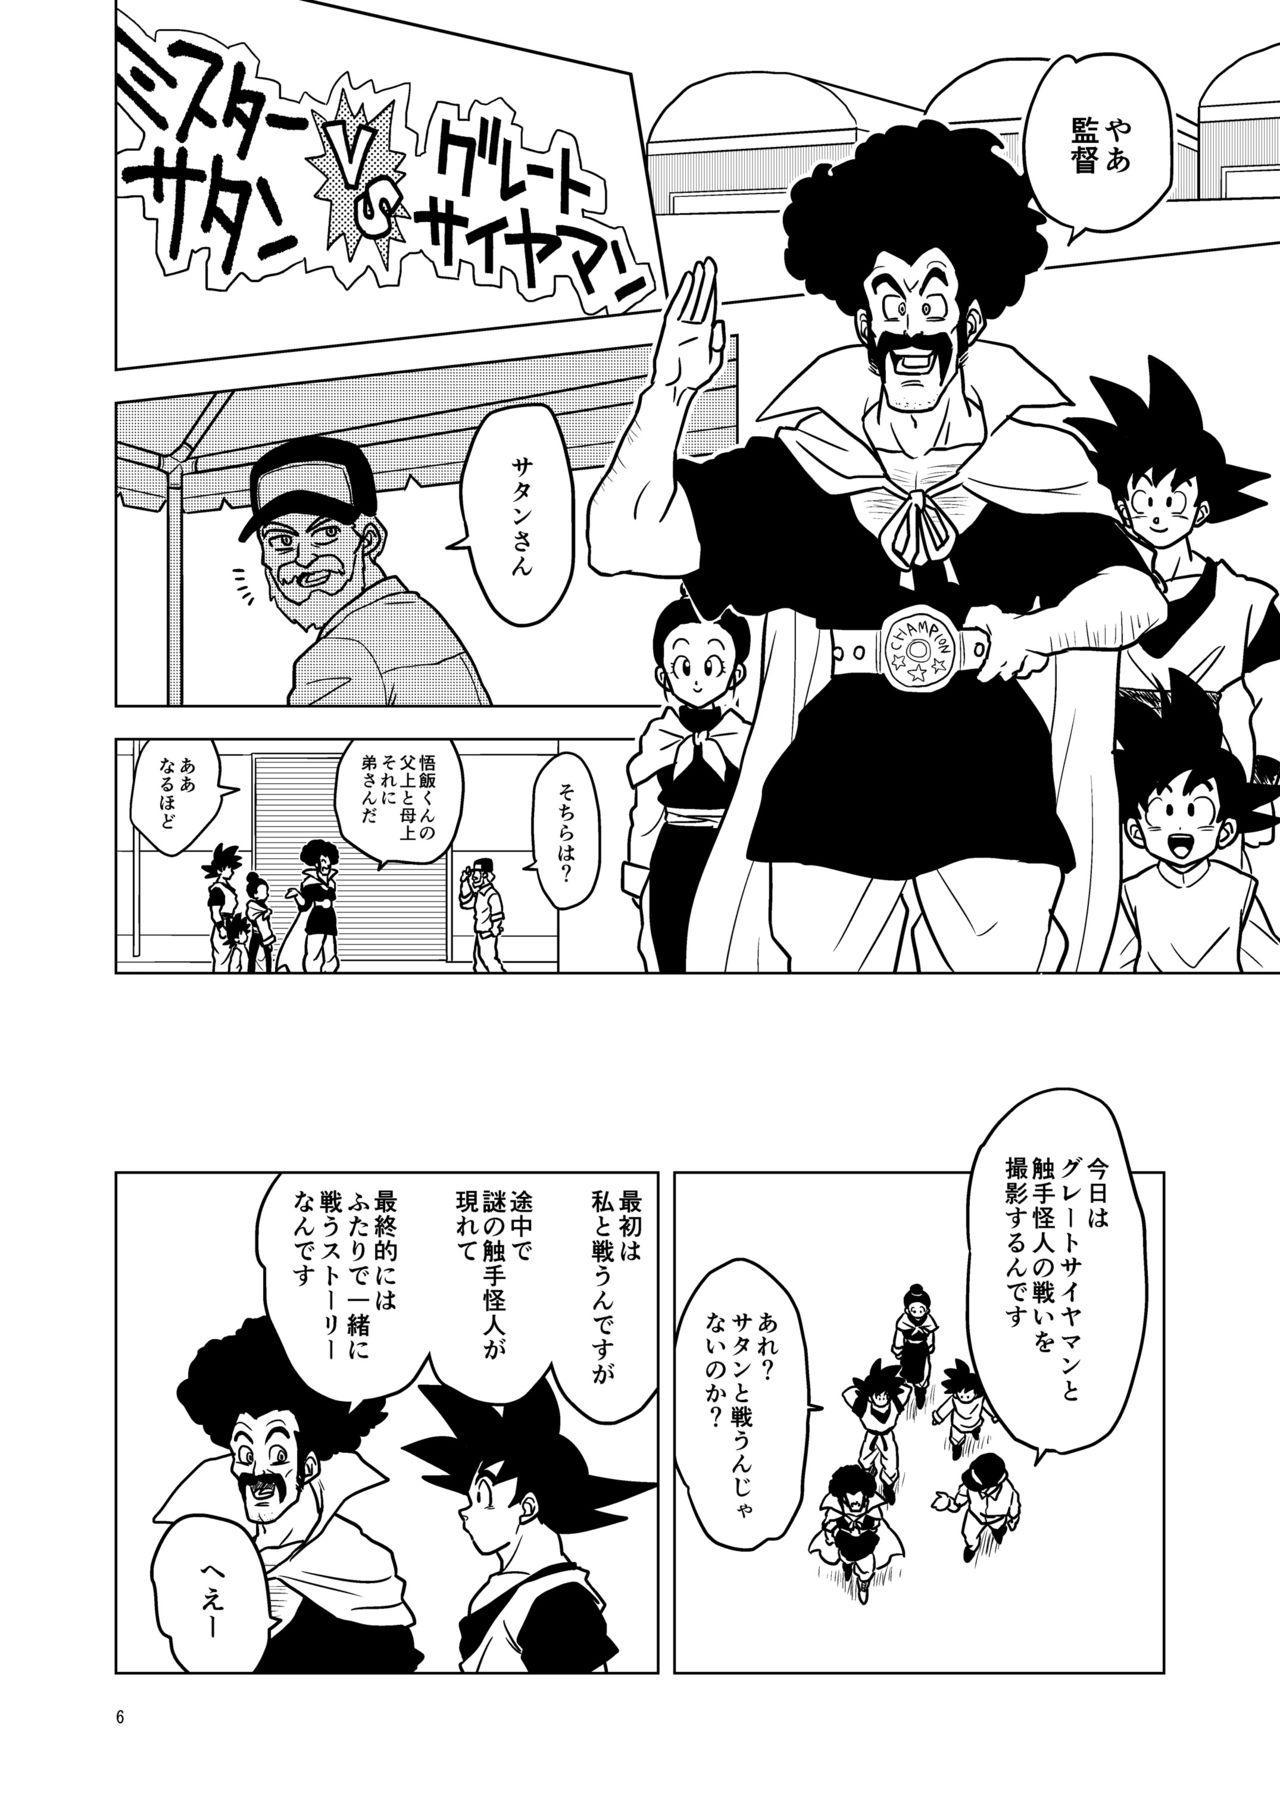 Great Saiyaman vs Shokushu Kaijin 5